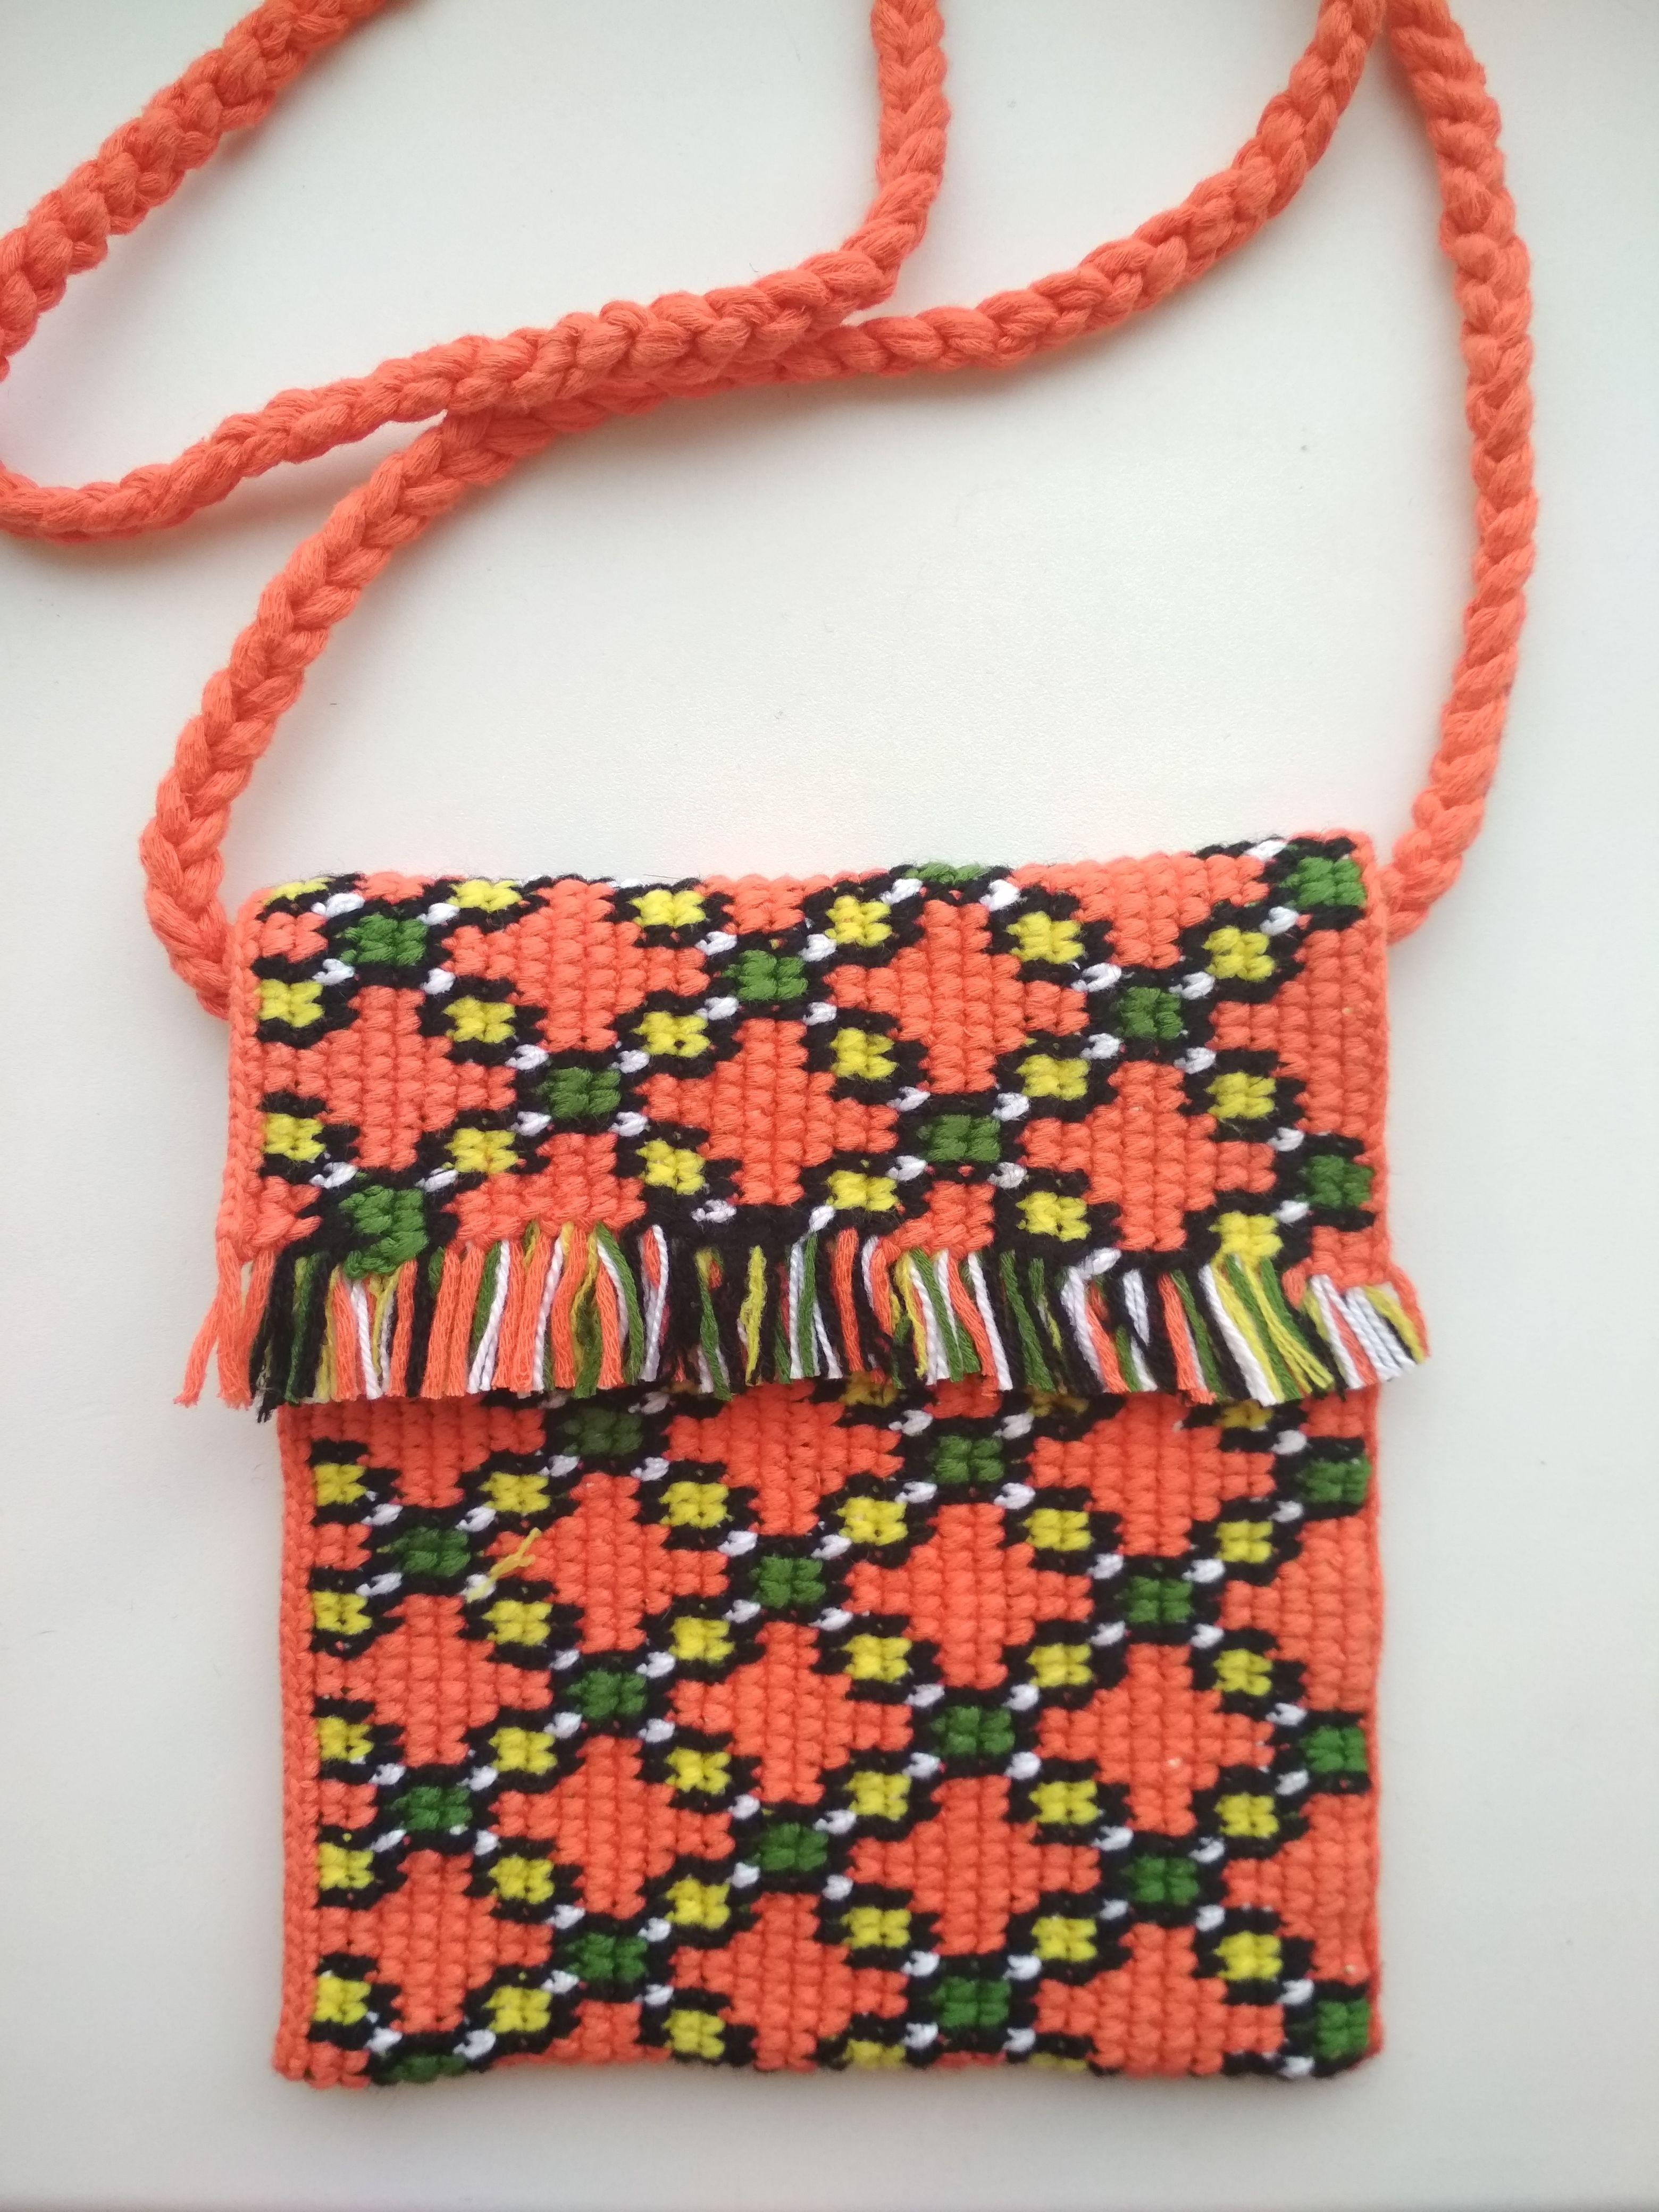 1190eaf3c2b Boho small orange crossbody bag Crochet ethnic mandarine handbag сlutch  Colorful tapestry crochet bag